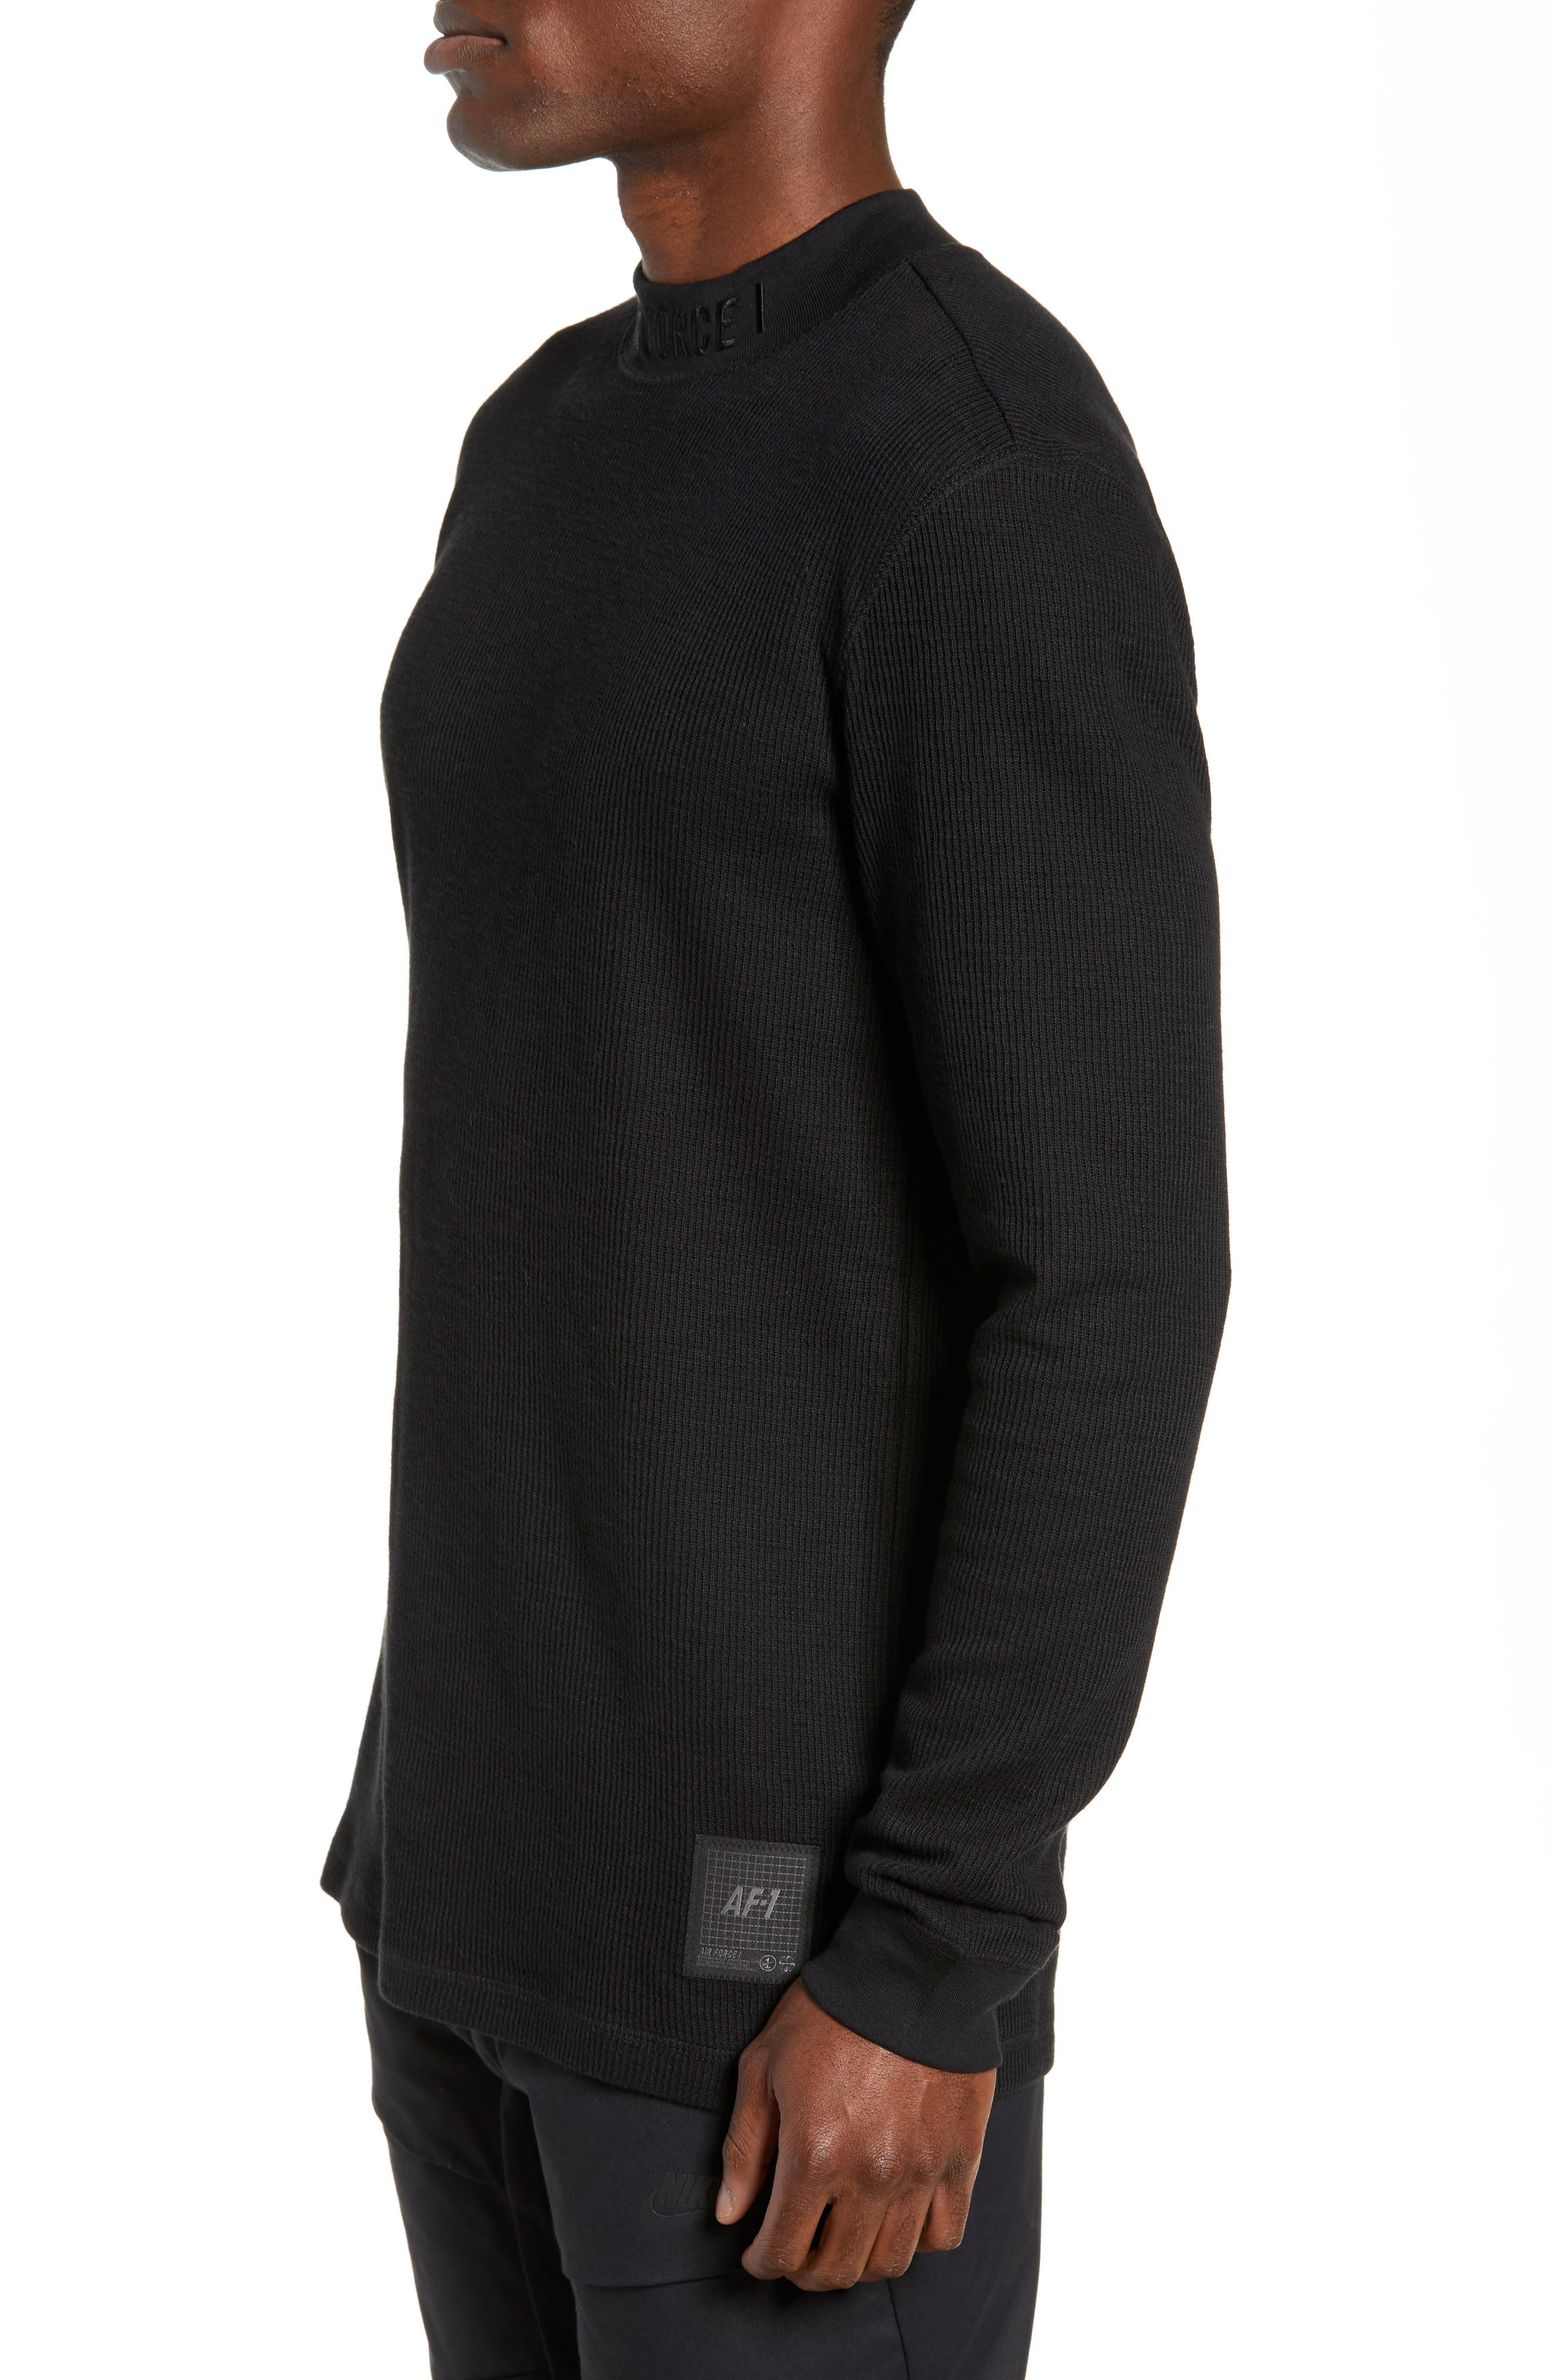 Sportswear Air Force 1 Long Sleeve Top,                             Alternate thumbnail 3, color,                             BLACK